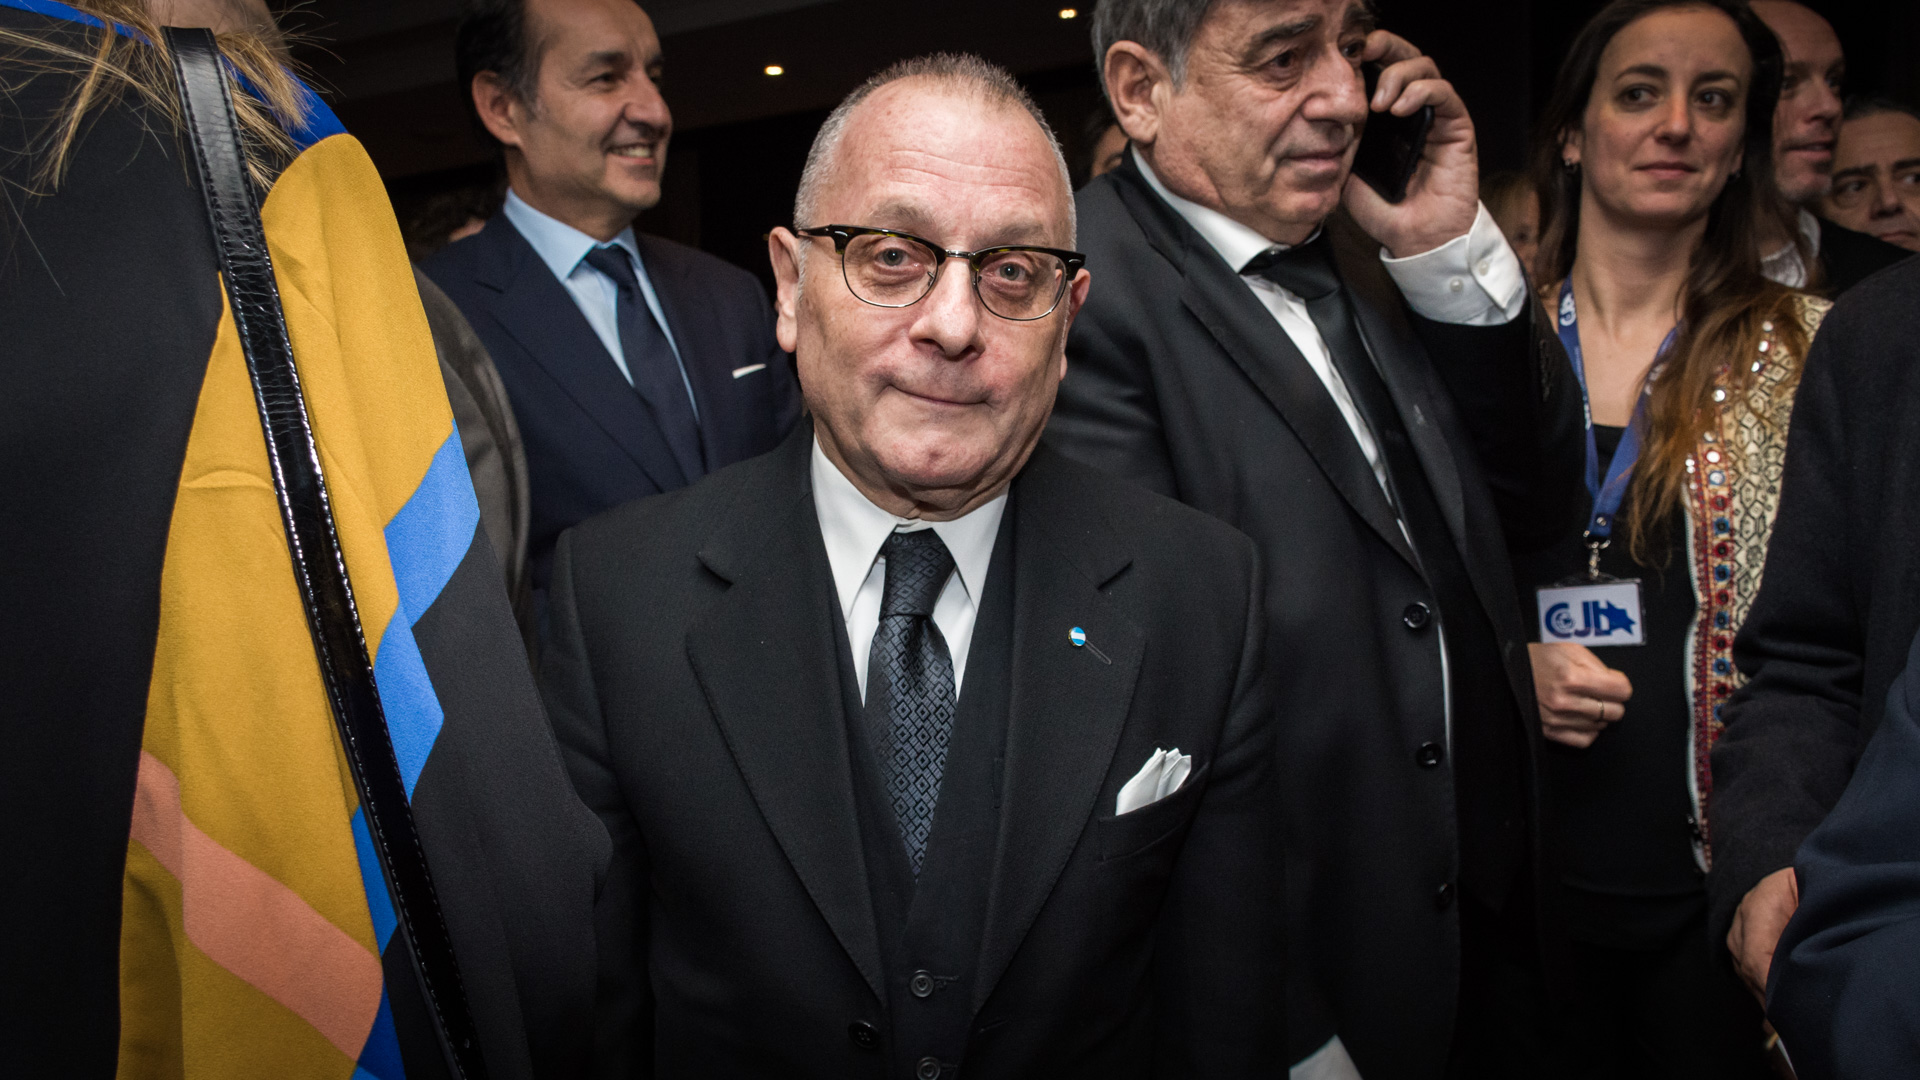 El canciller argentino, Jorge Faurie (Martín Rosenzveig)